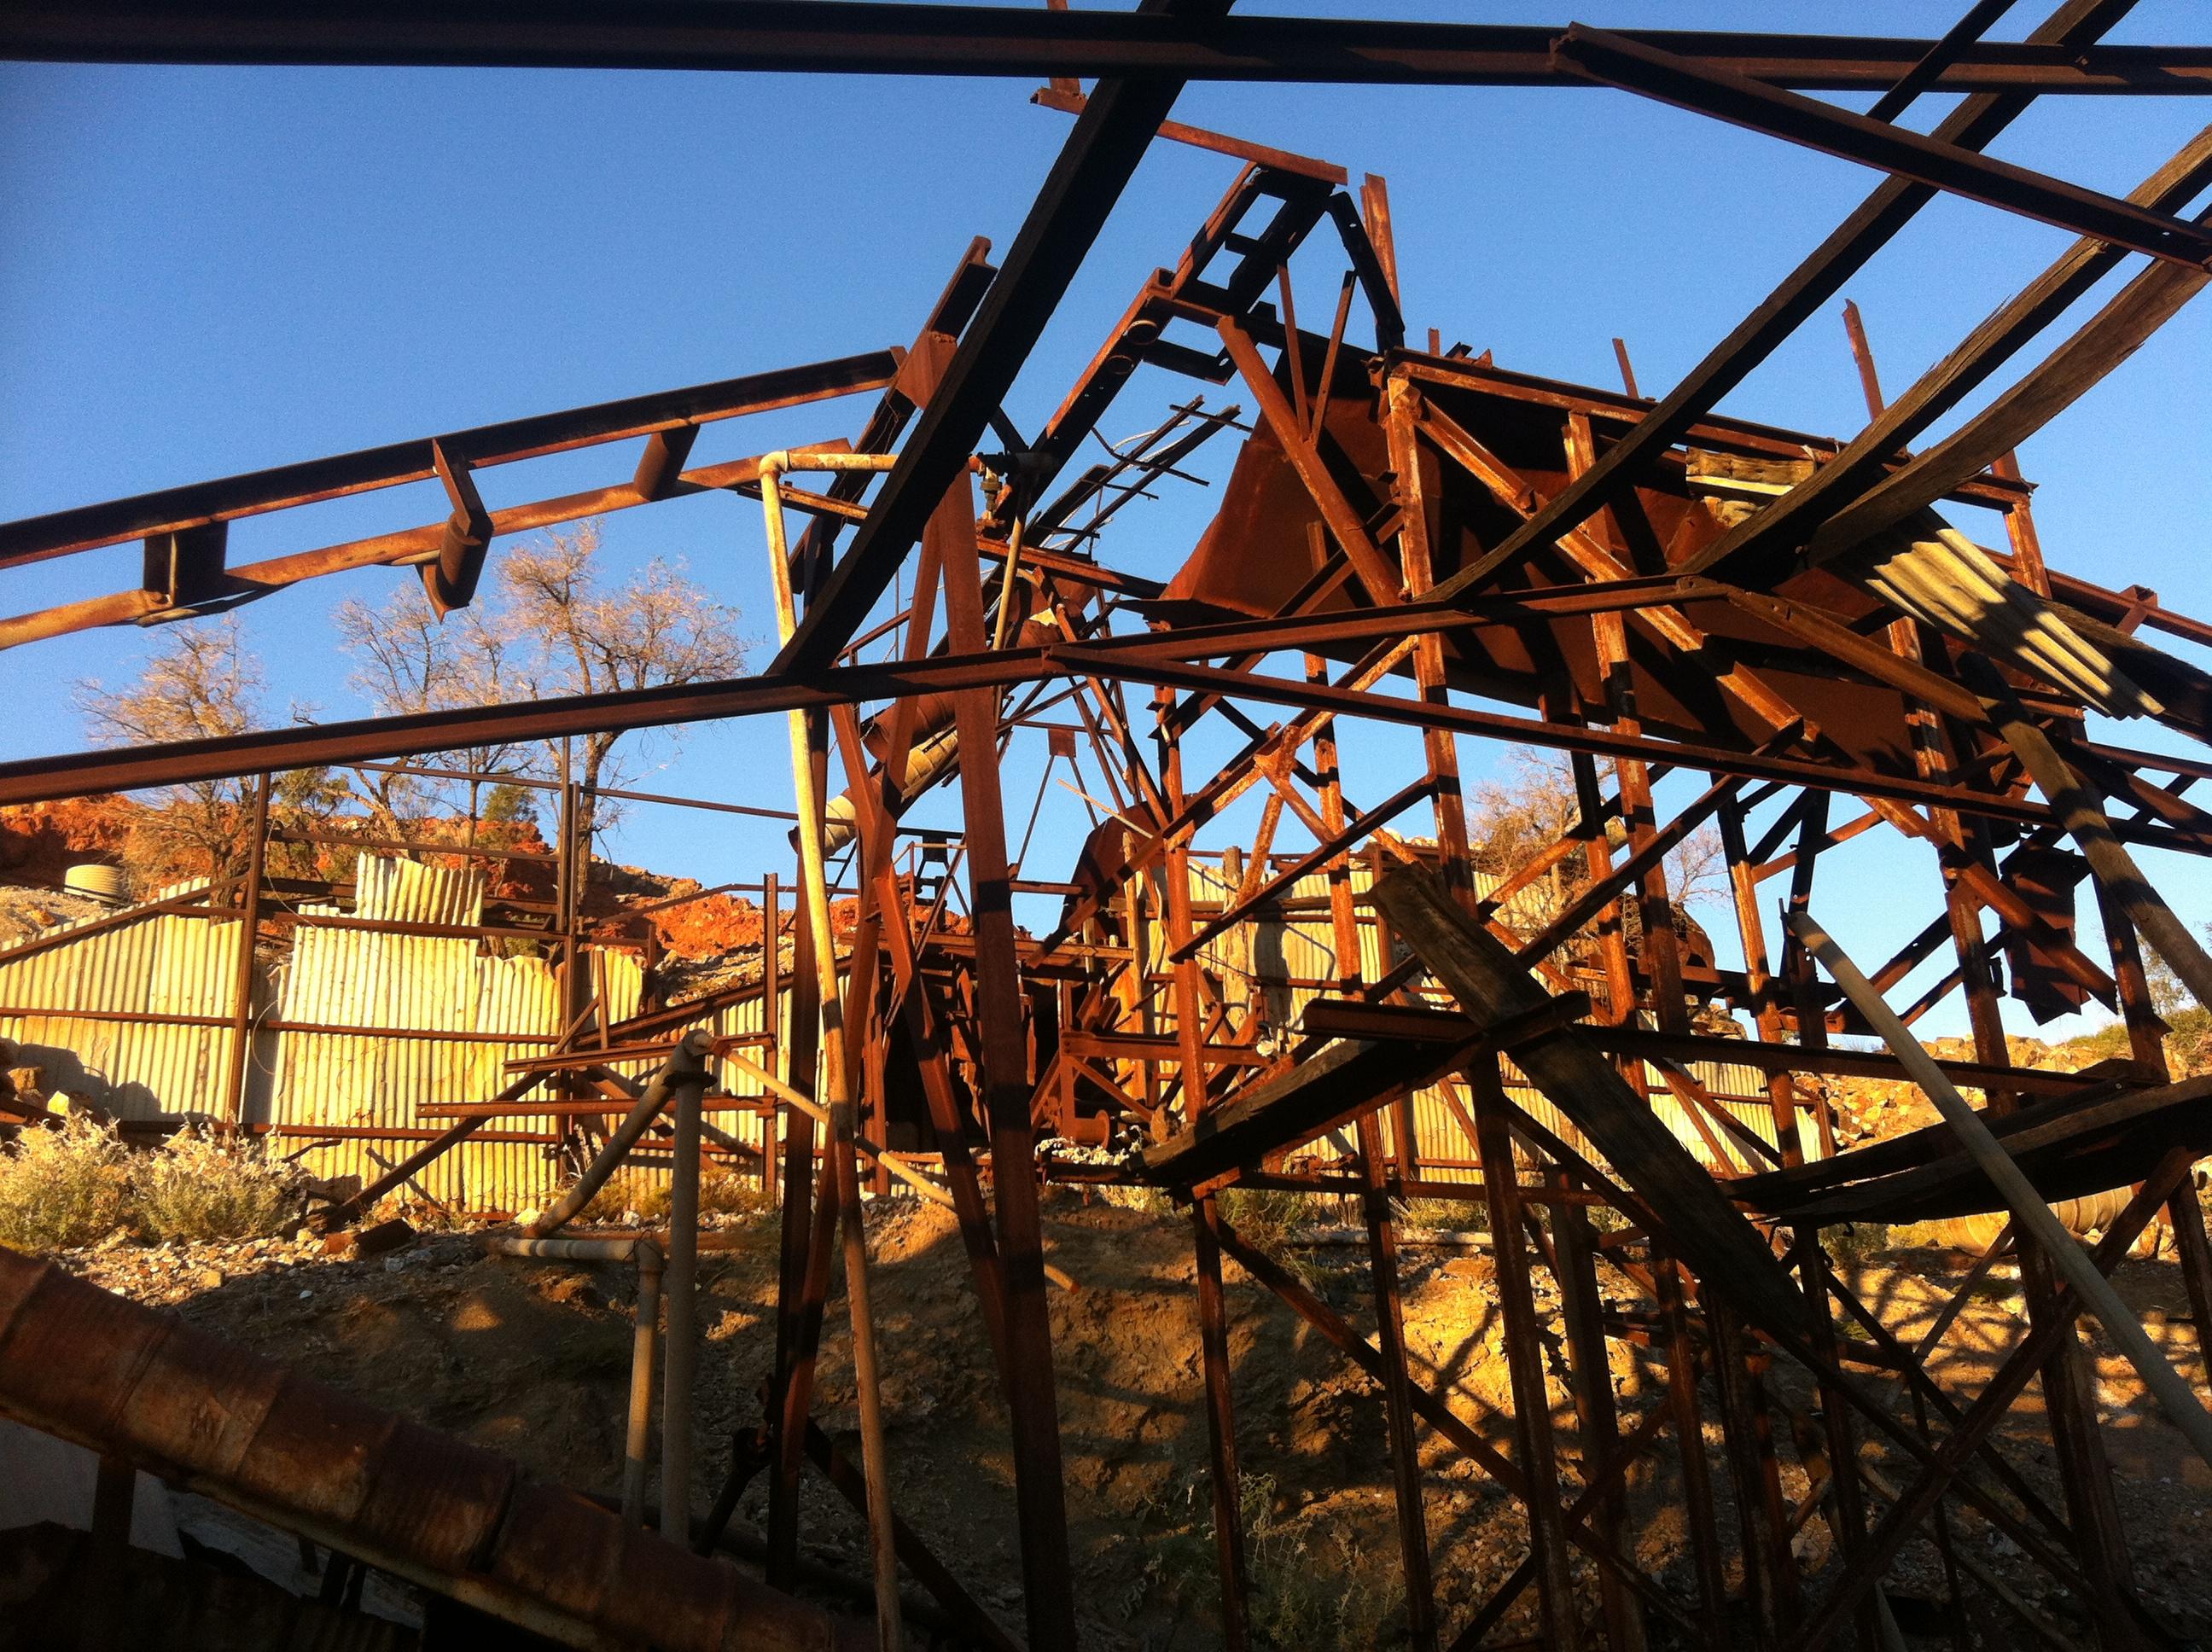 Ragged Hill #4 East Pilbara WA